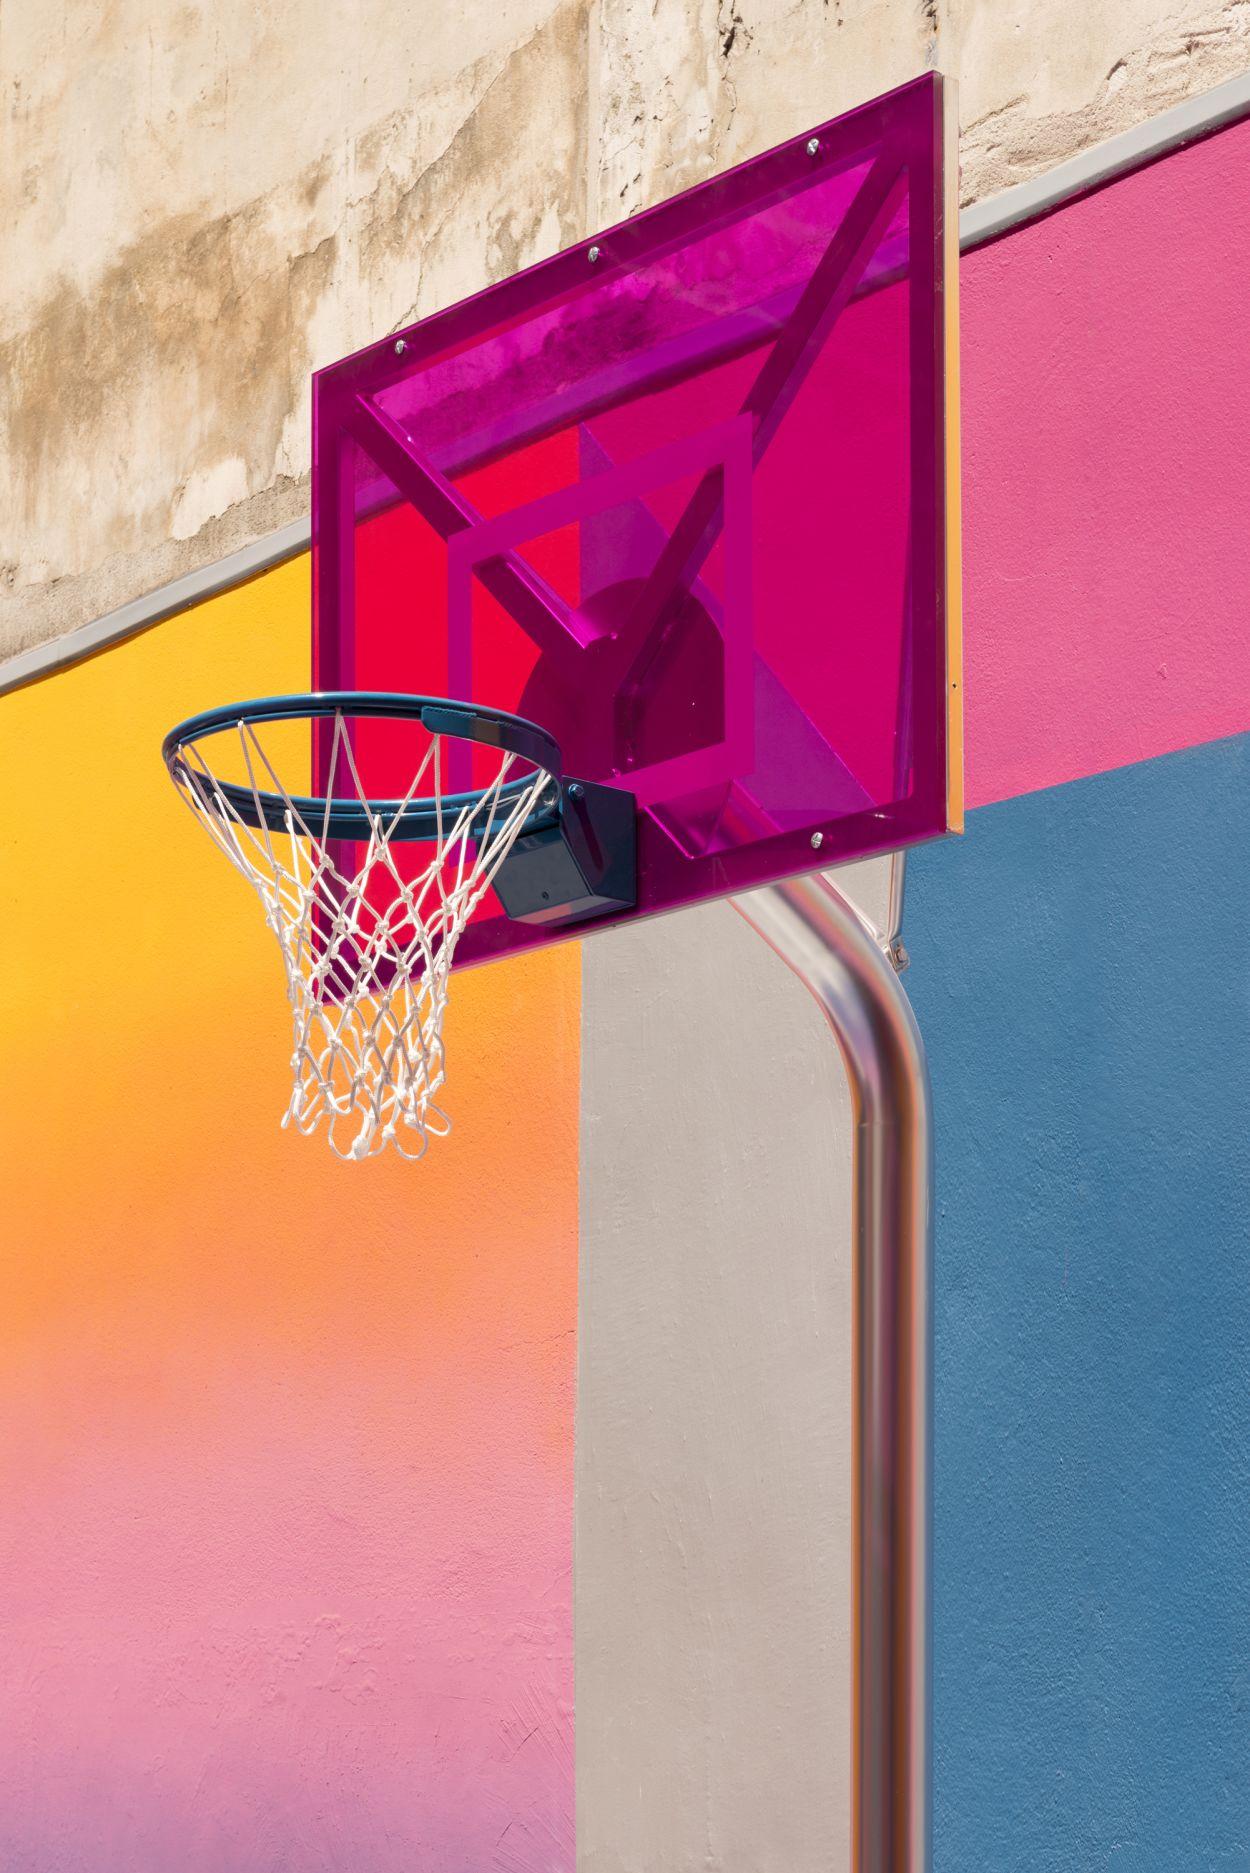 Pigalle, Basketball Court, paris, NikeLab